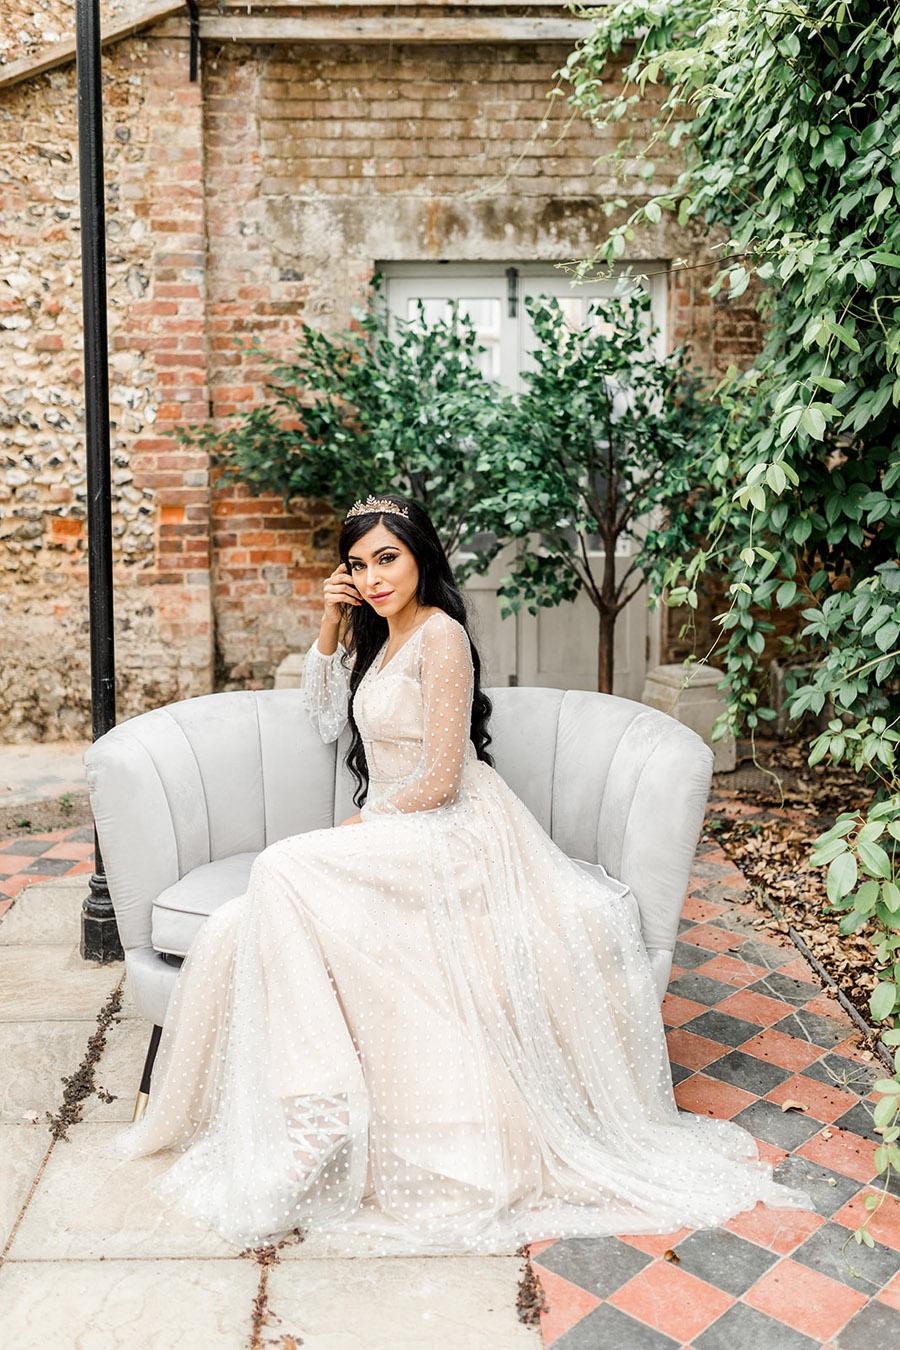 Modern Boho wedding style inspiration from Slindon House, photographer credit Kelsie Scully Photography (3)